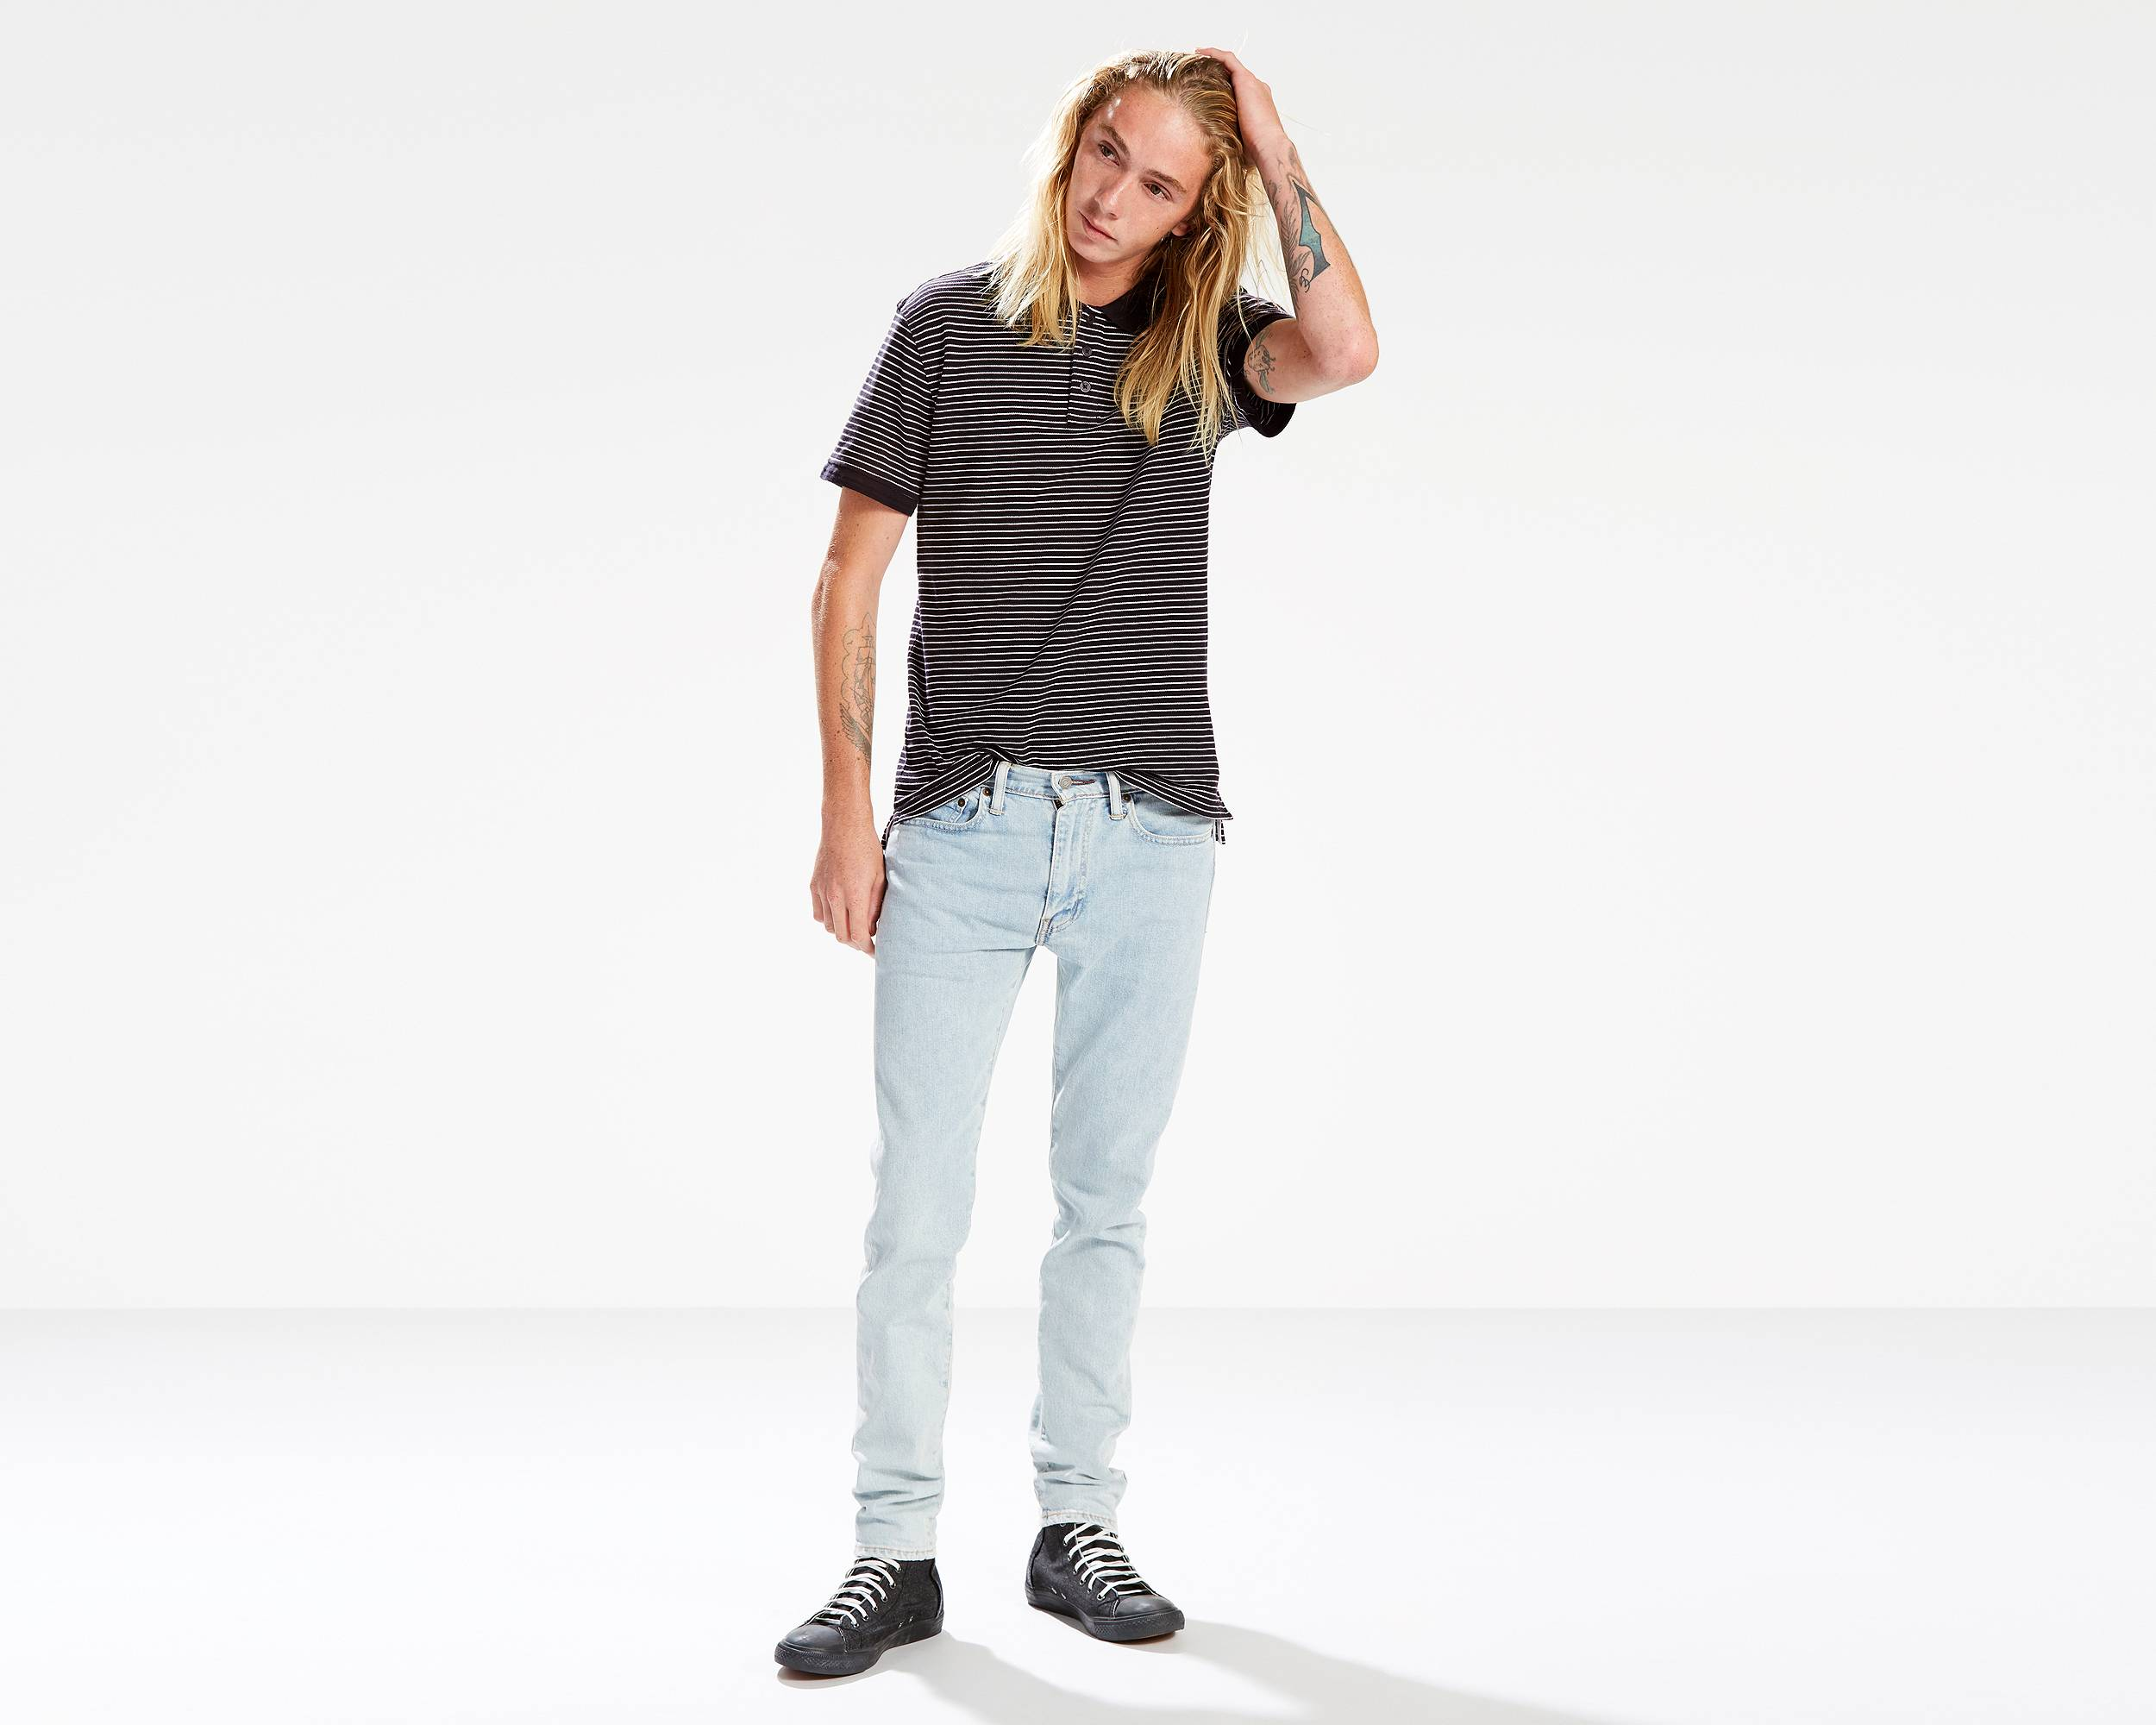 519™ Extreme Skinny Stretch Jeans | Summerburst |Levi's® United ...